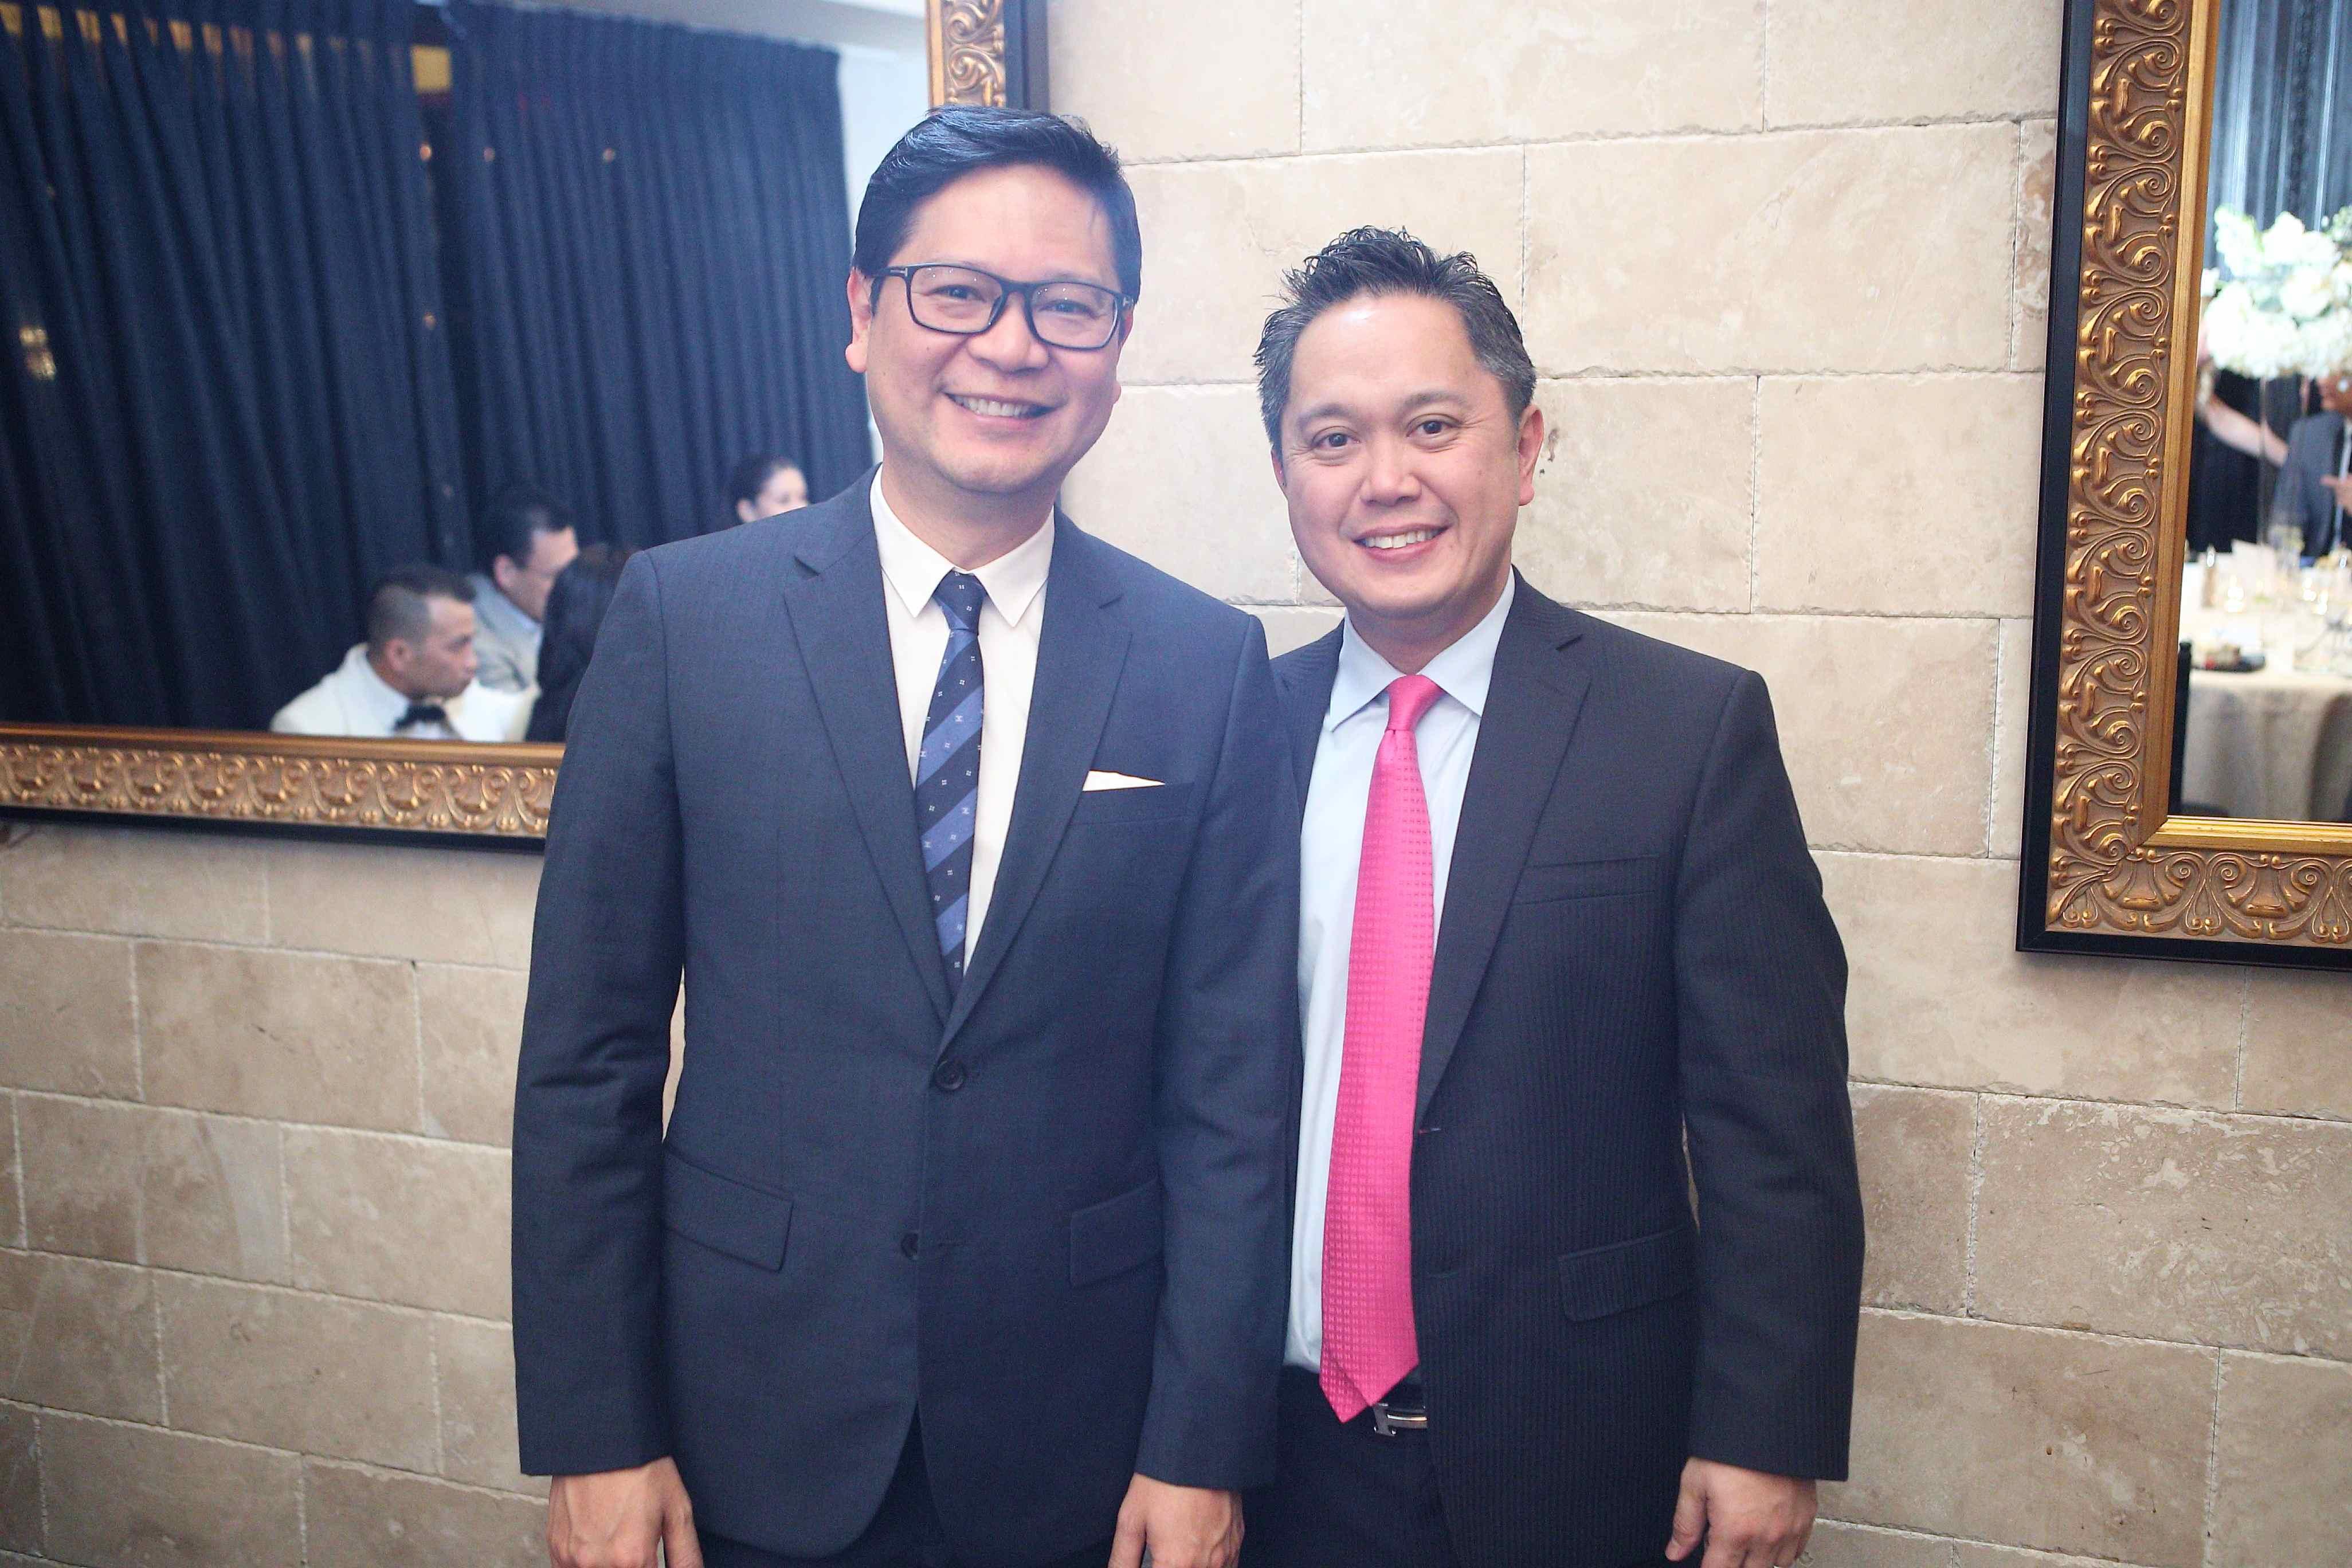 William Kao, Daryl Dichoso